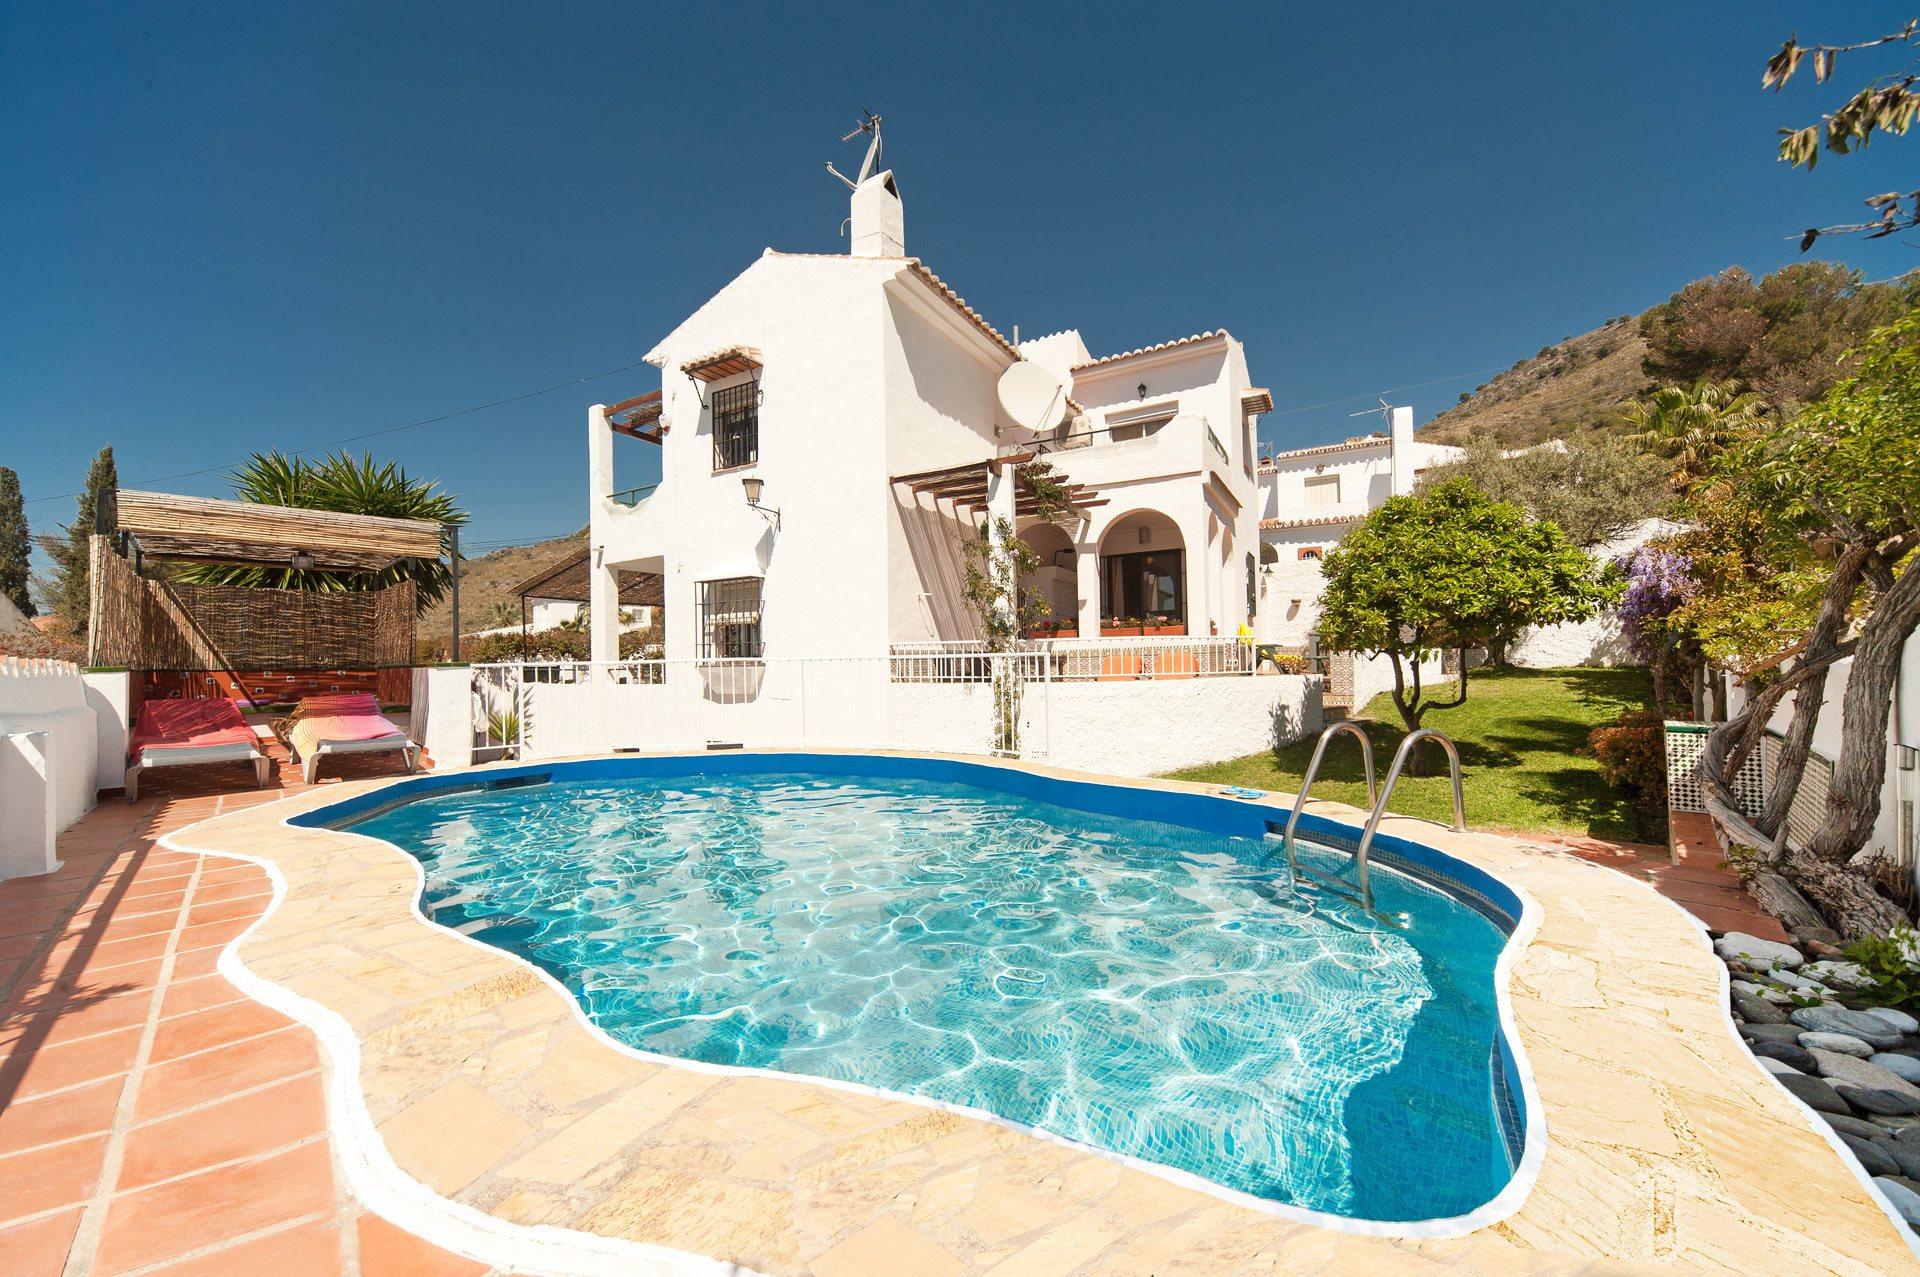 Villa Cuesta Cielo, Nerja, Andalucia, Spain